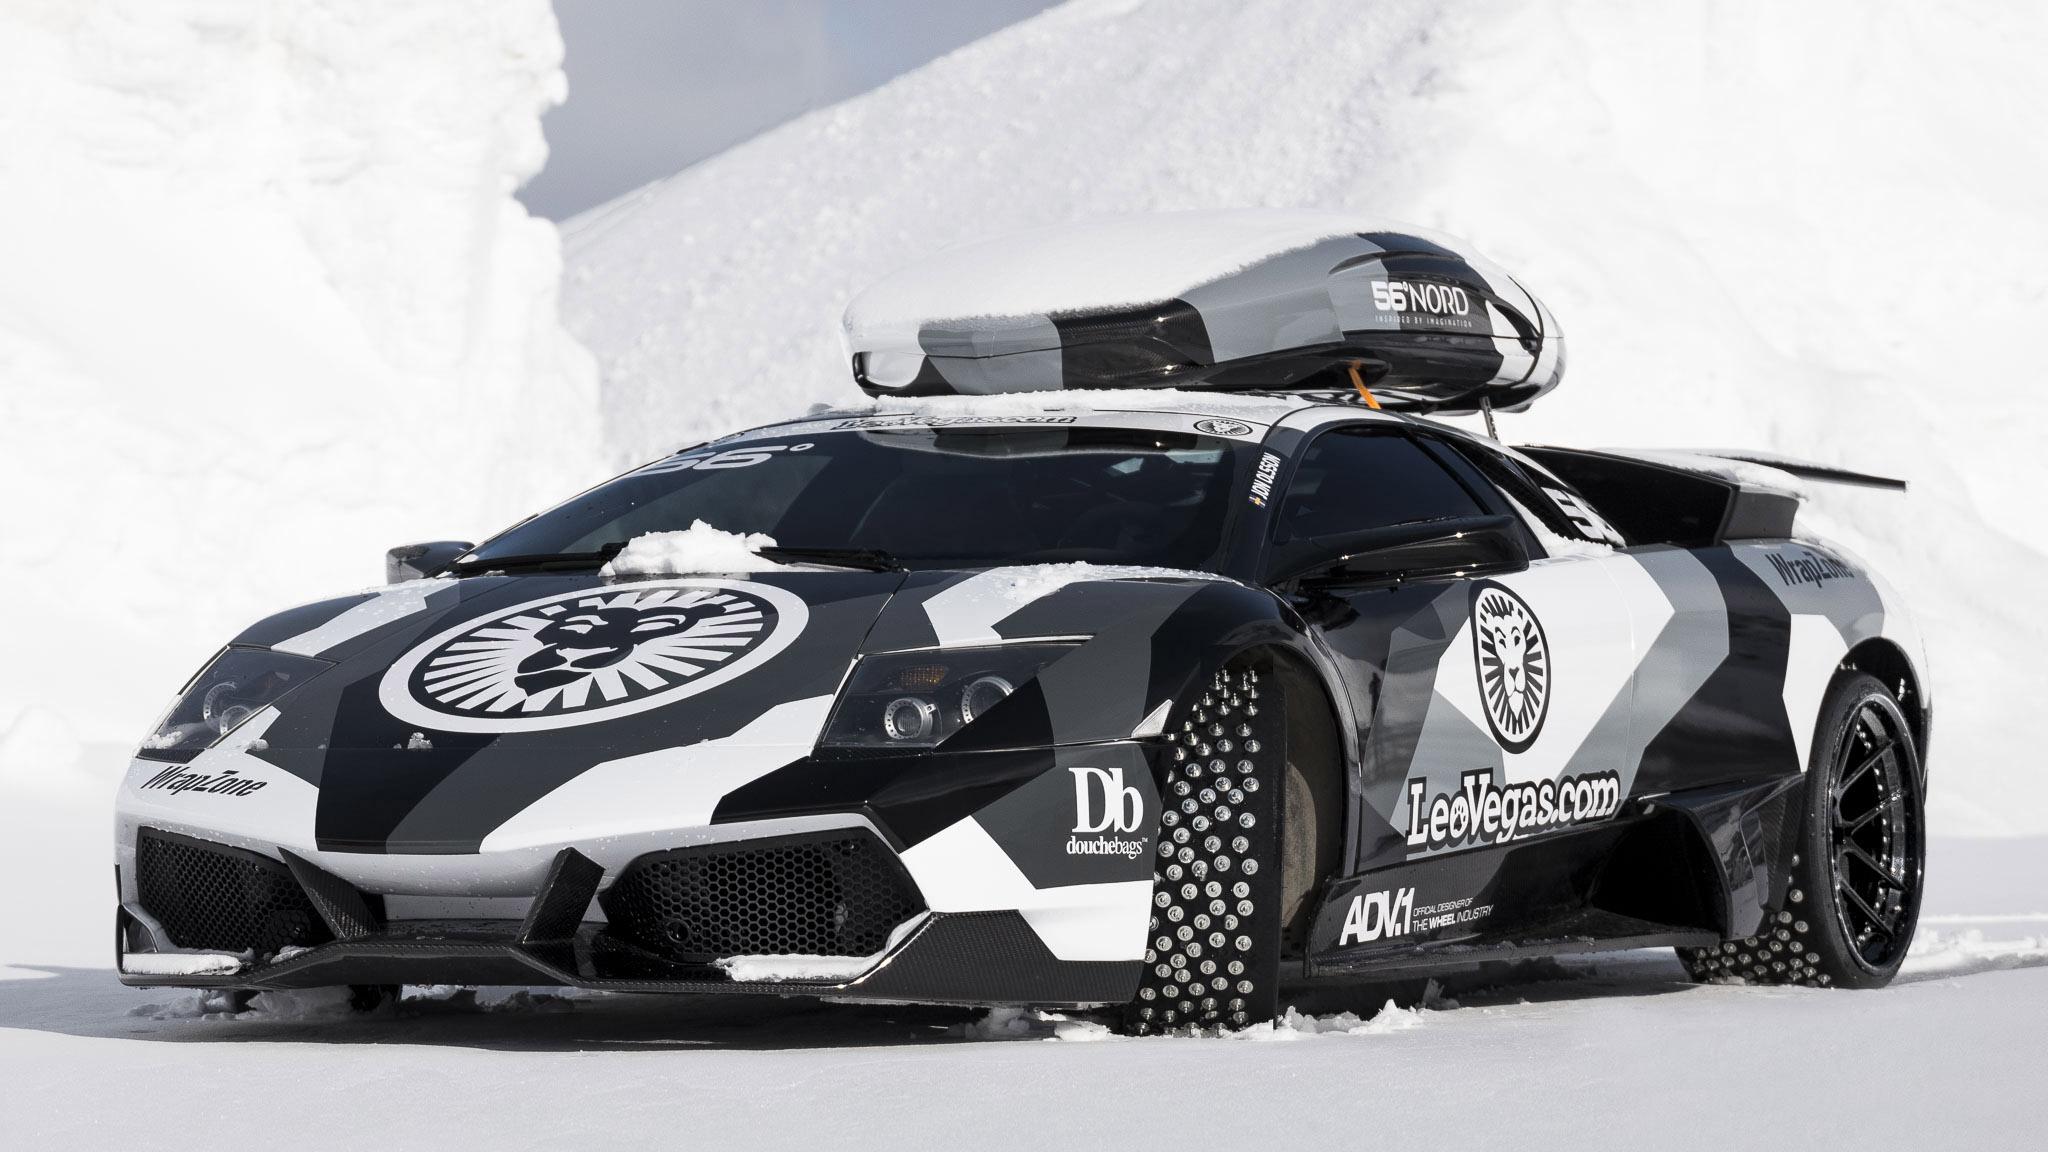 Jon Olsson Lamborghini Murcielago Put To The Extreme